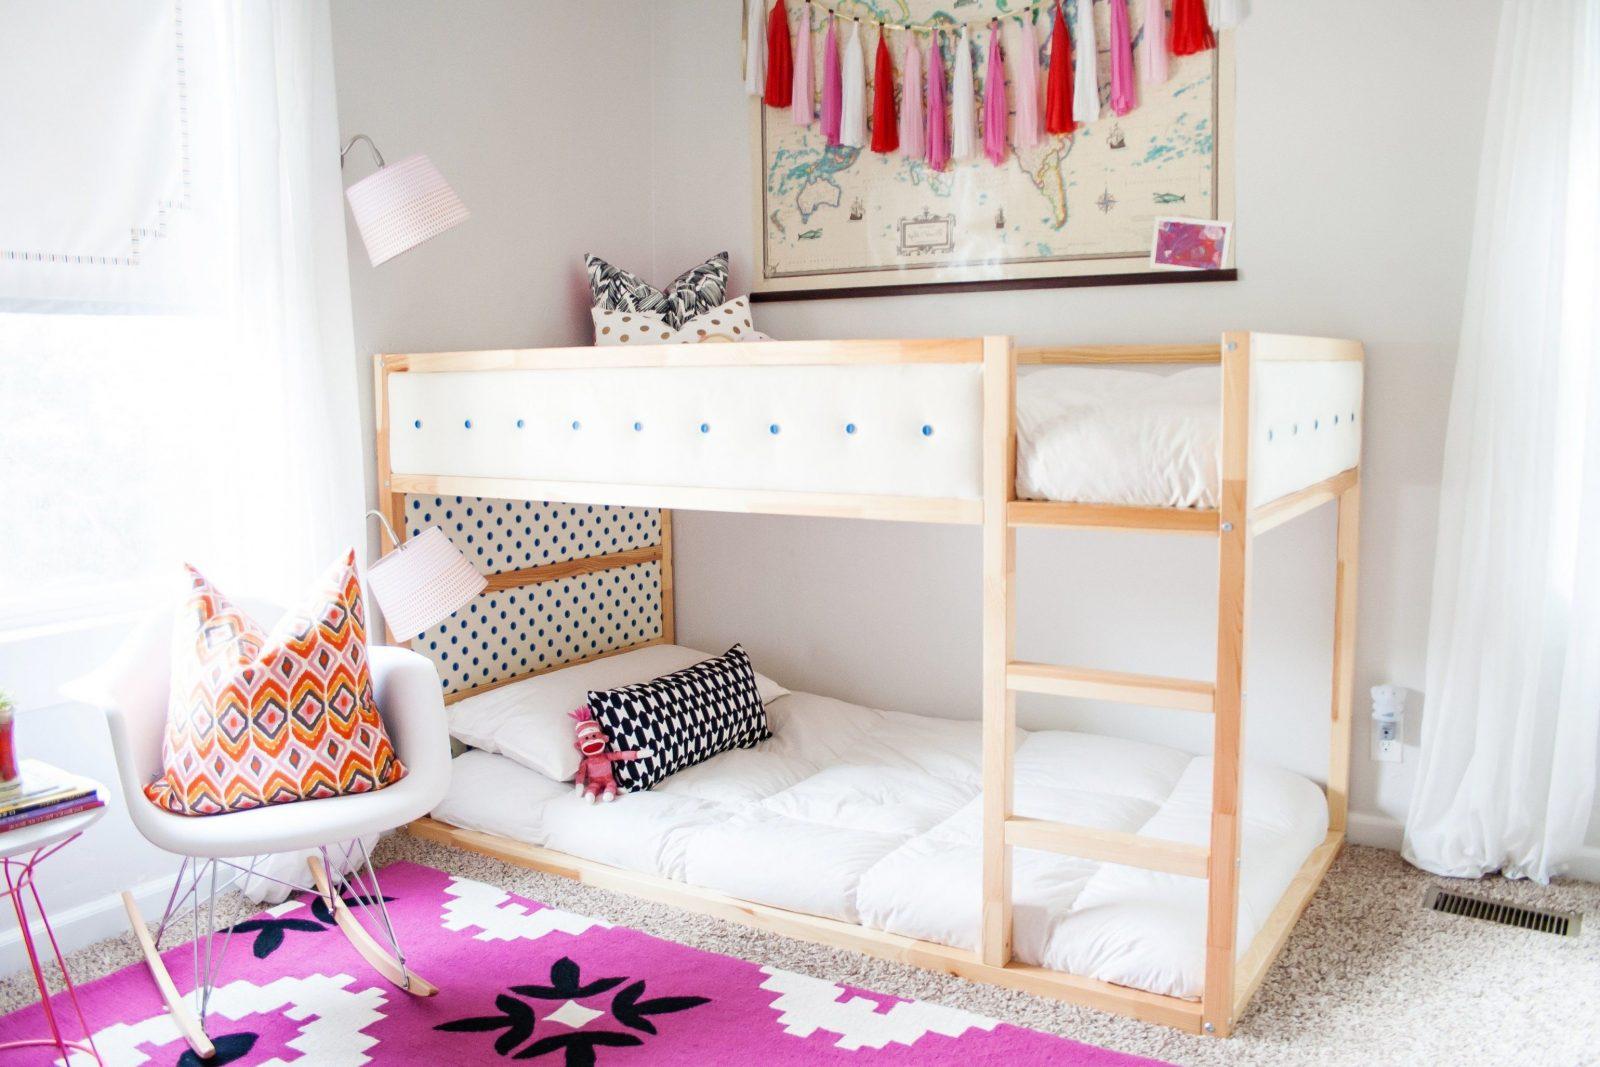 Kleines Gitterbett Ikea Himmel Kinderbett Fa R Babybett Ein Bett von Himmel Für Bett Ikea Bild